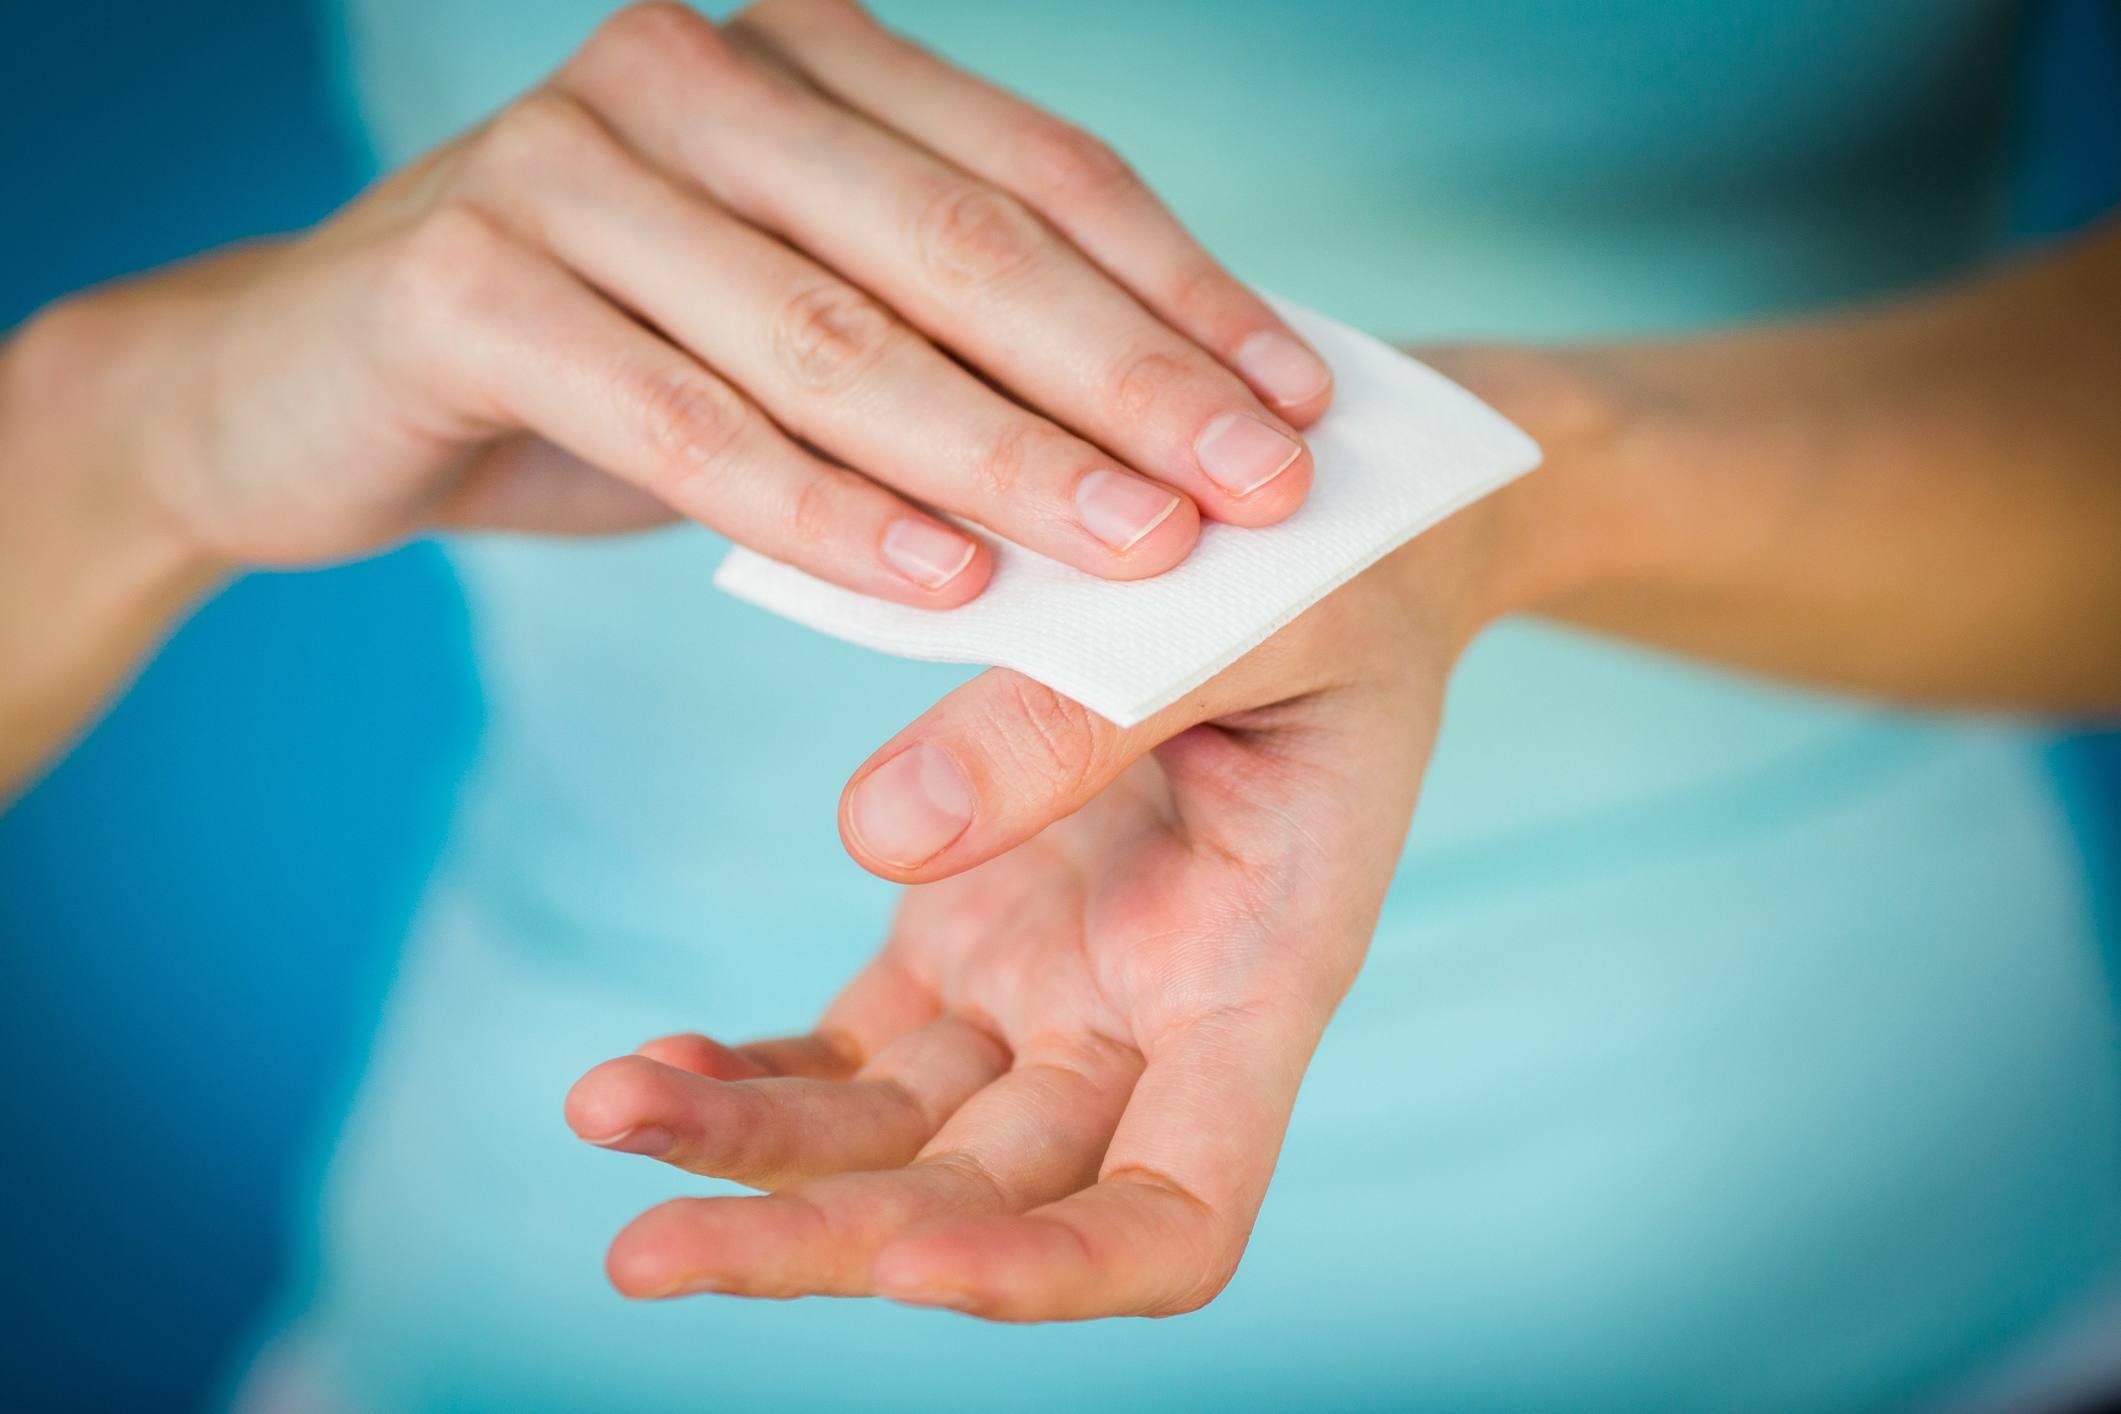 Woman applying cotton pad to hand